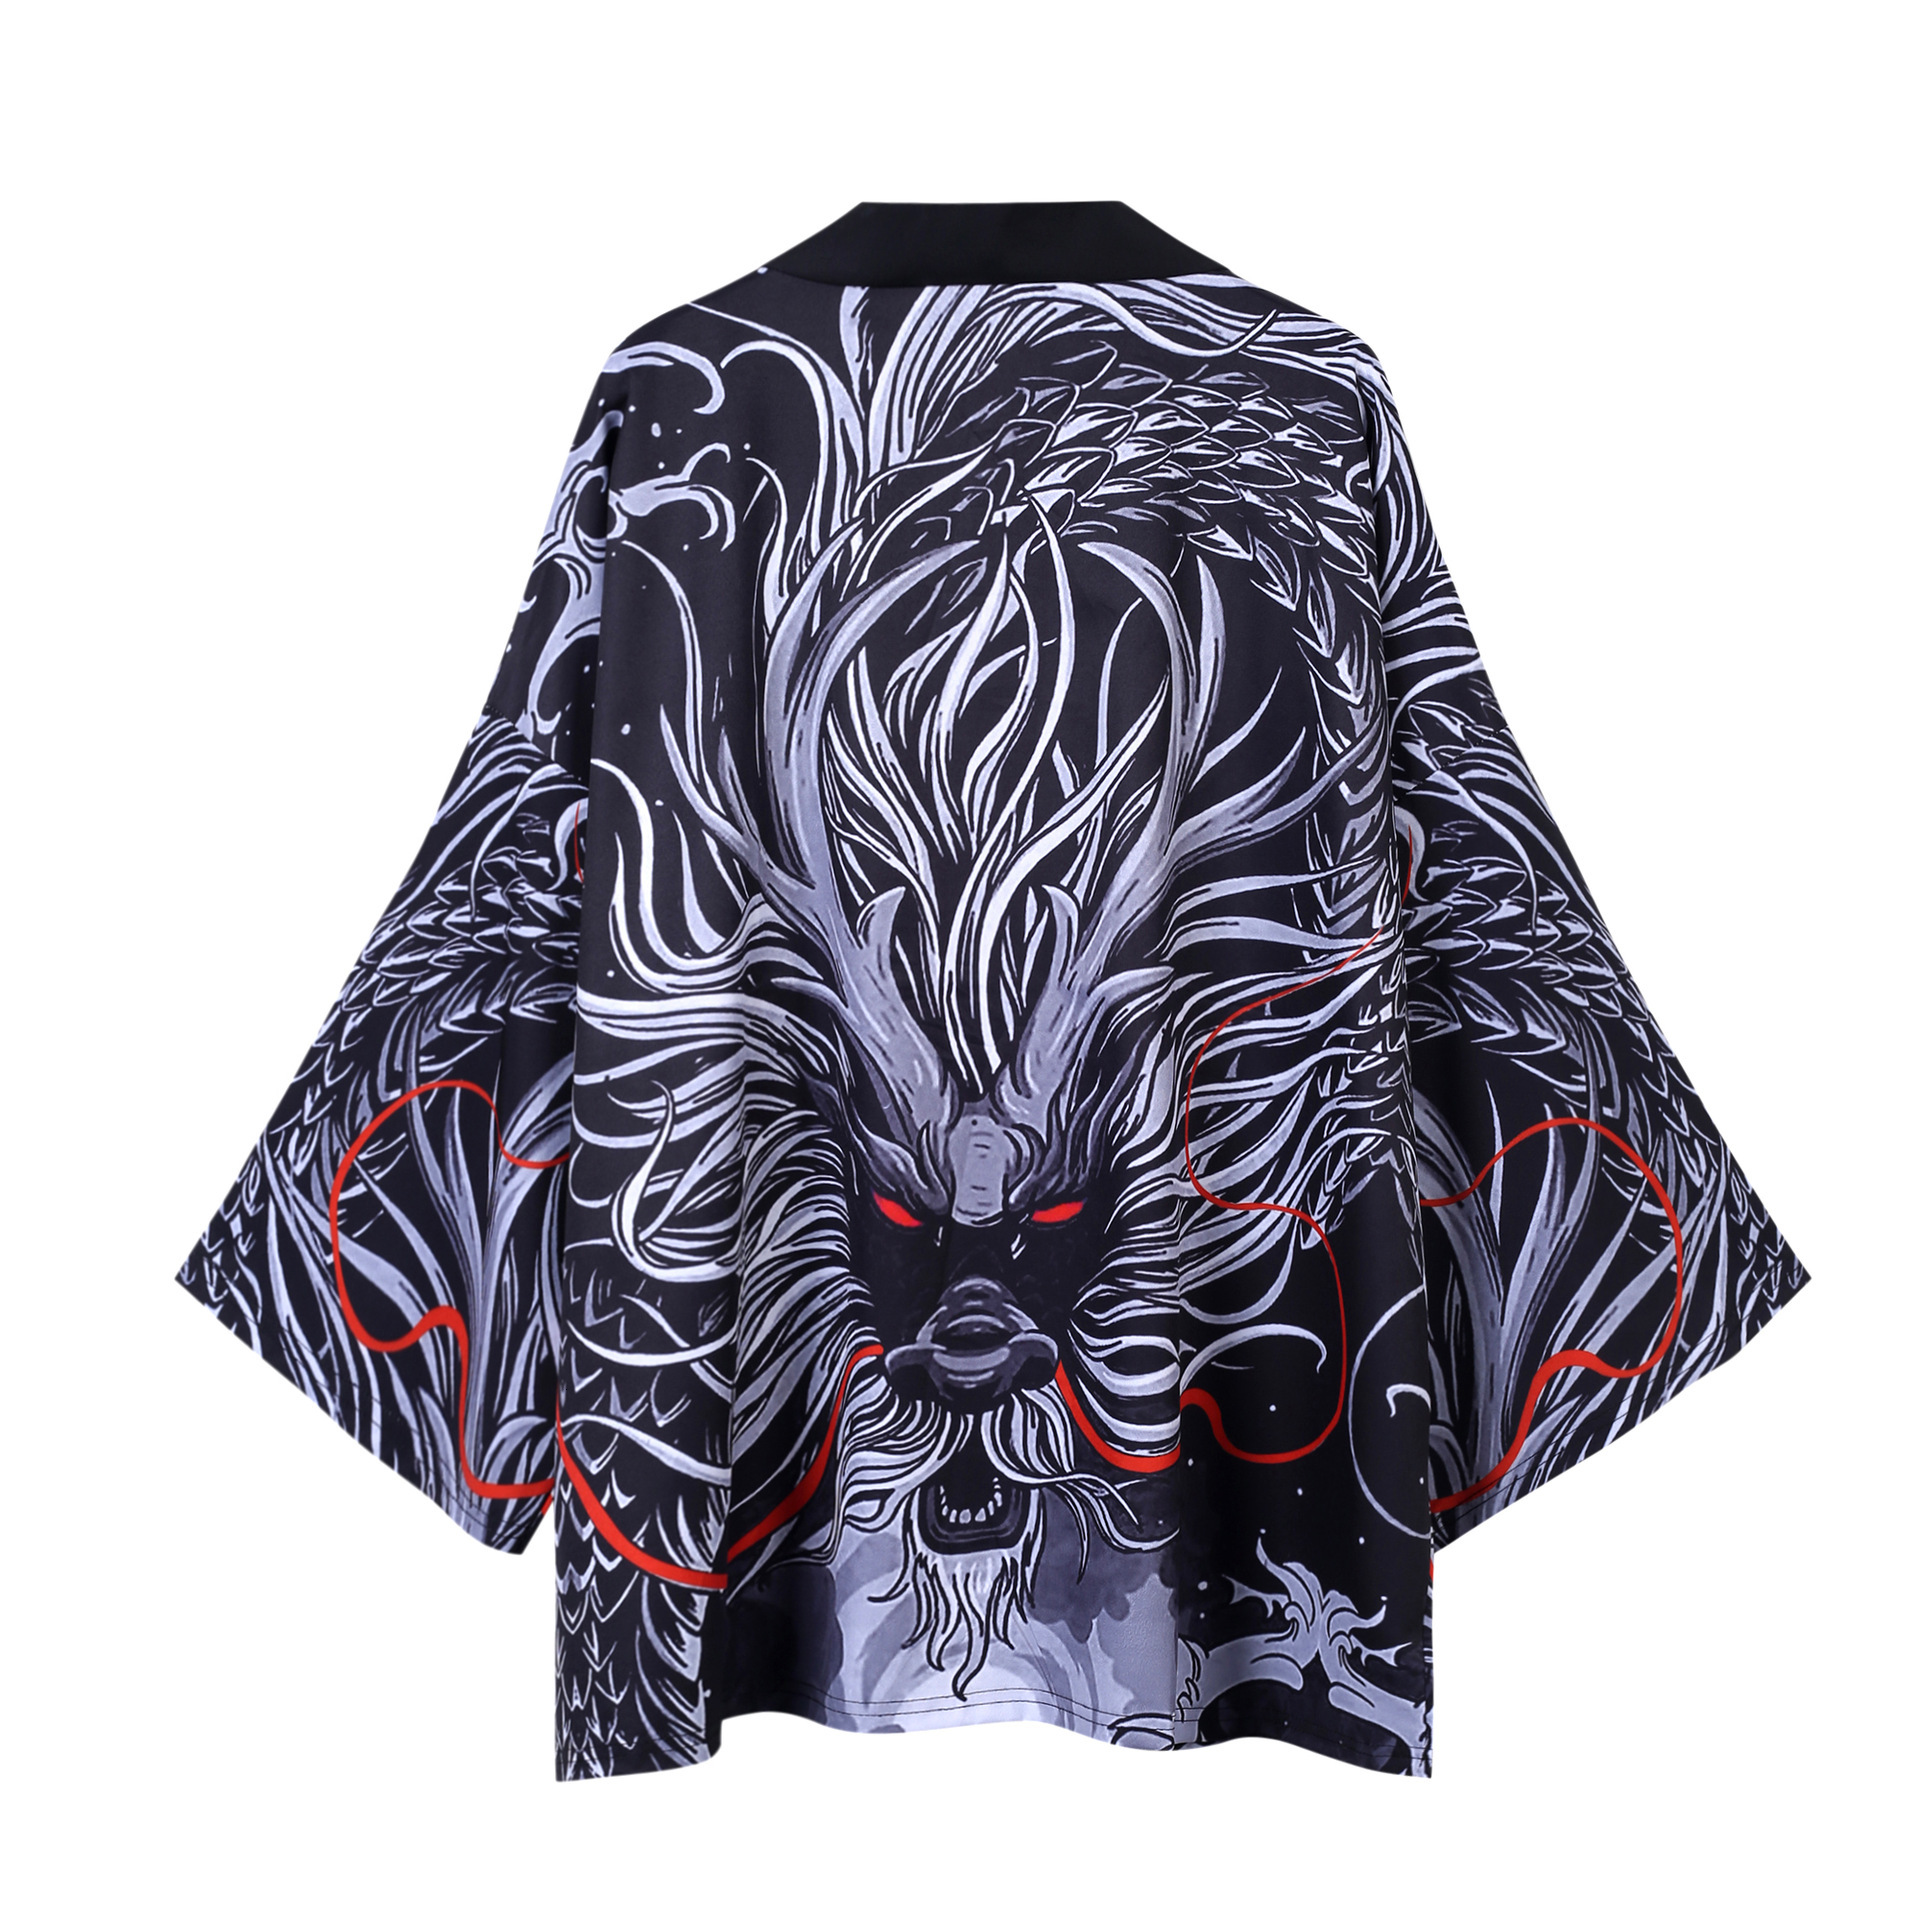 Japanese Ukiyo-e Print Robe Carp Kimono Traditional Loose Seven-point Sleeve Robe Shirt Thin Section Cardigan Sunscreen Yukata